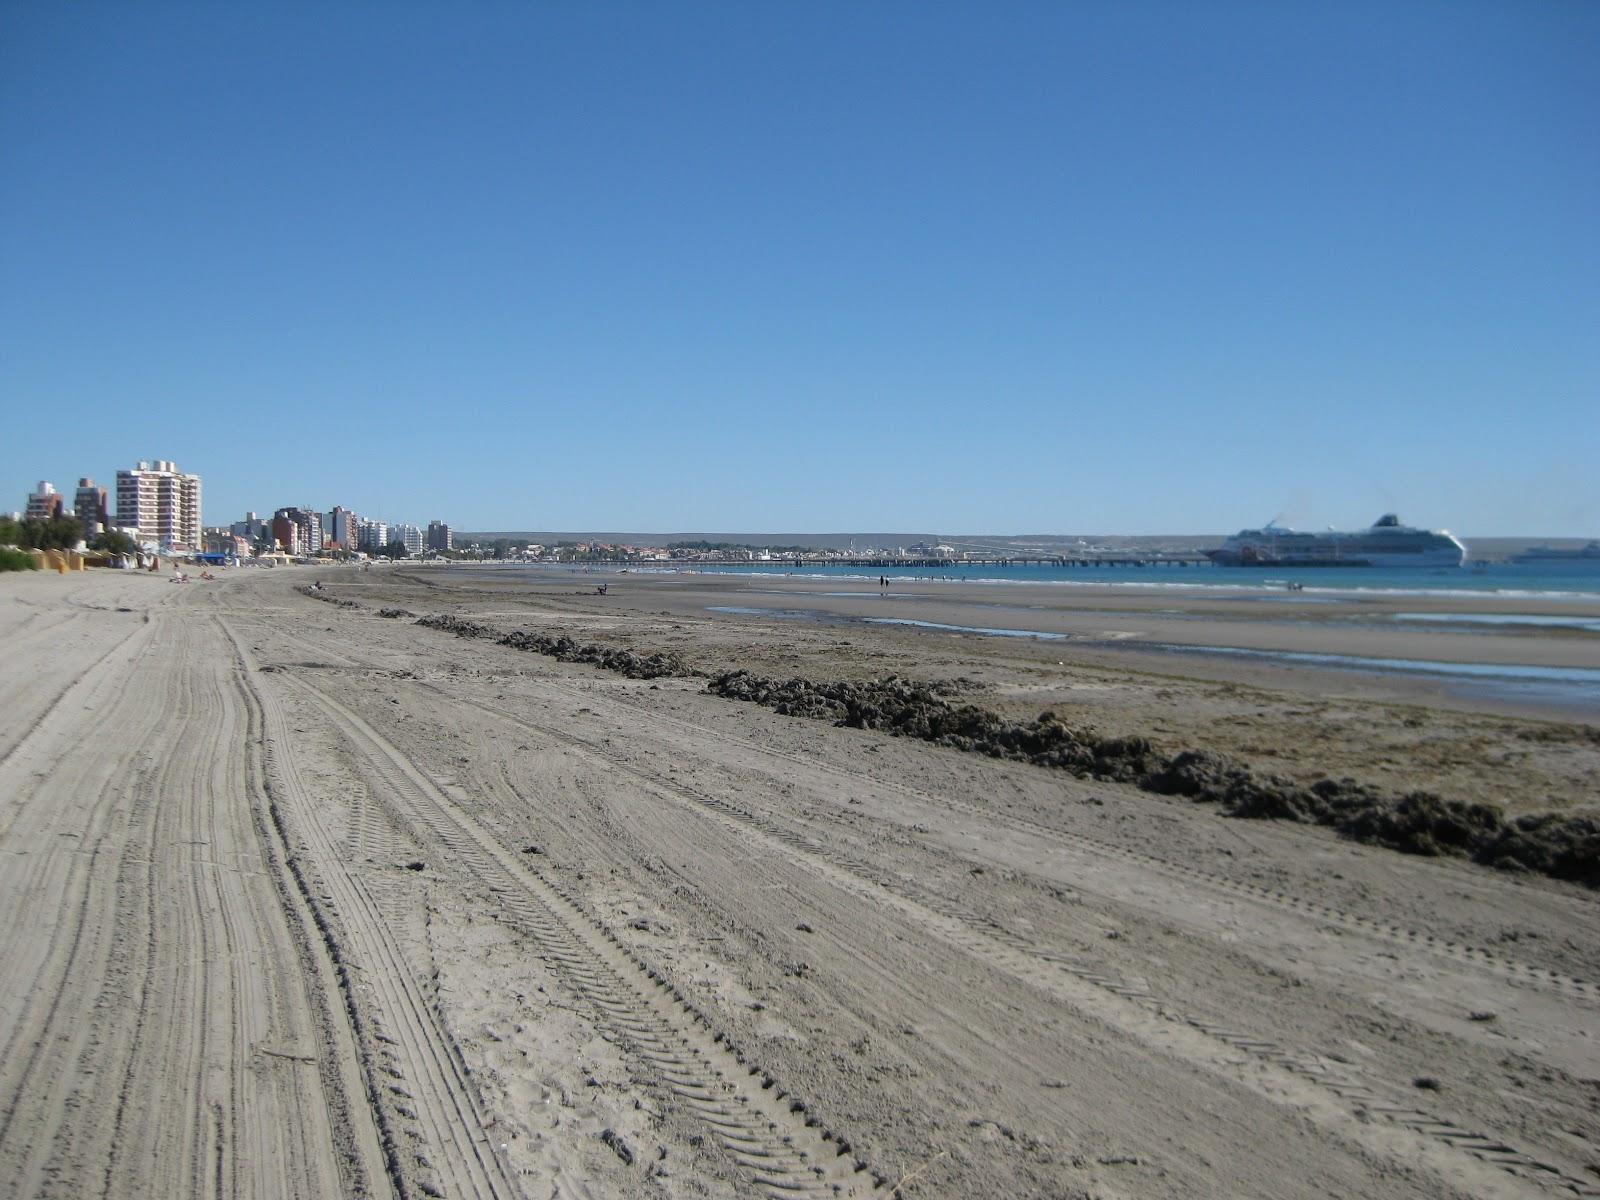 Puerto Madryn beach